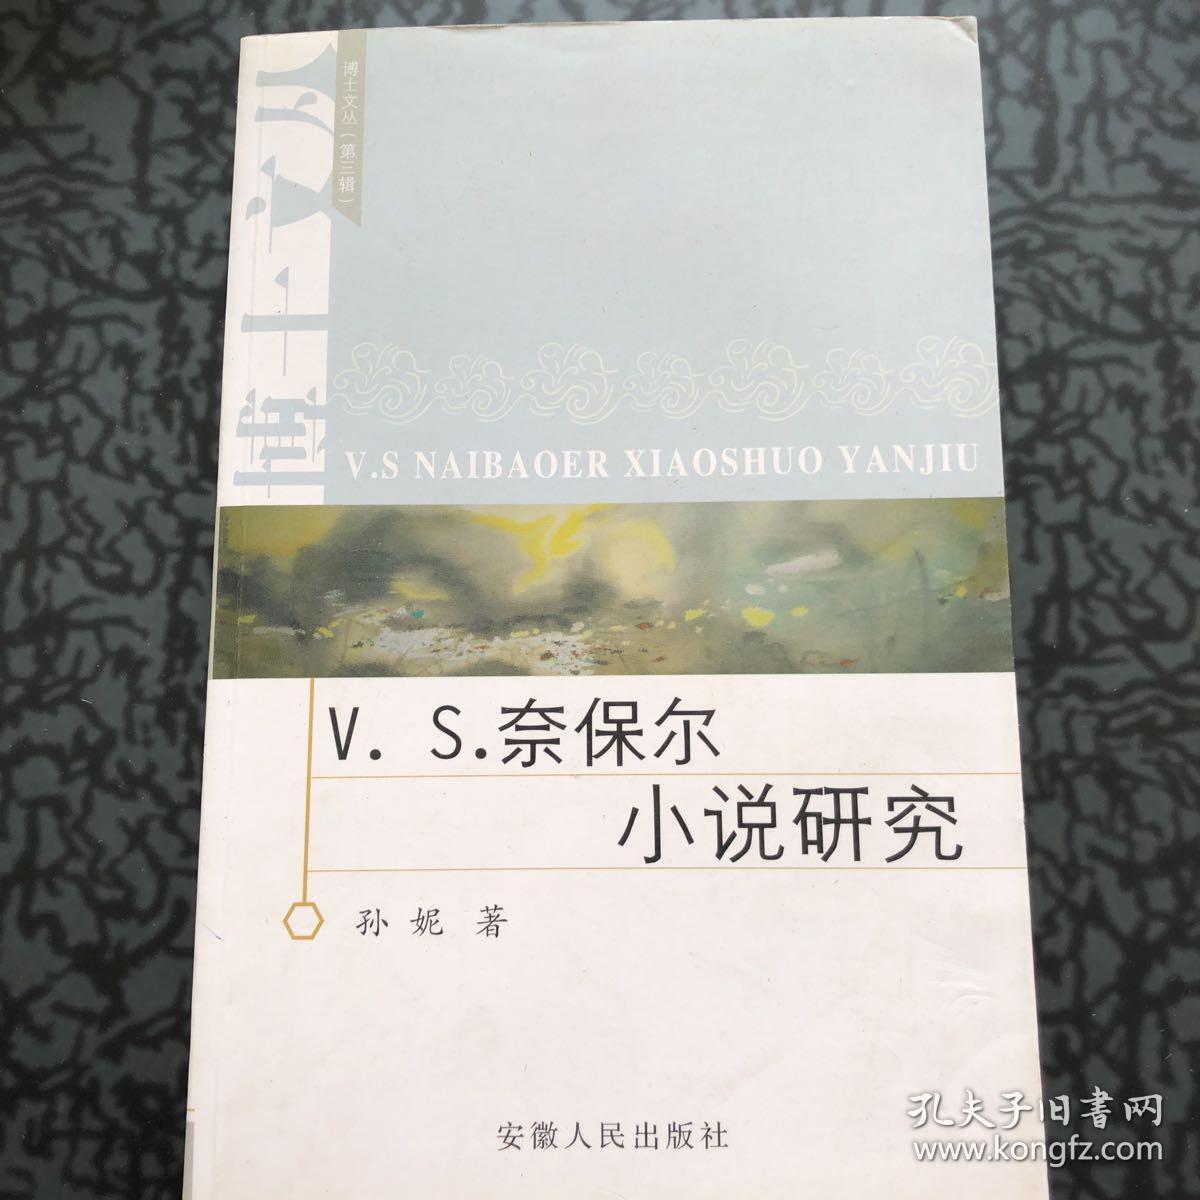 V. S. 奈保尔小说研究 /孙妮 安徽人民出版社